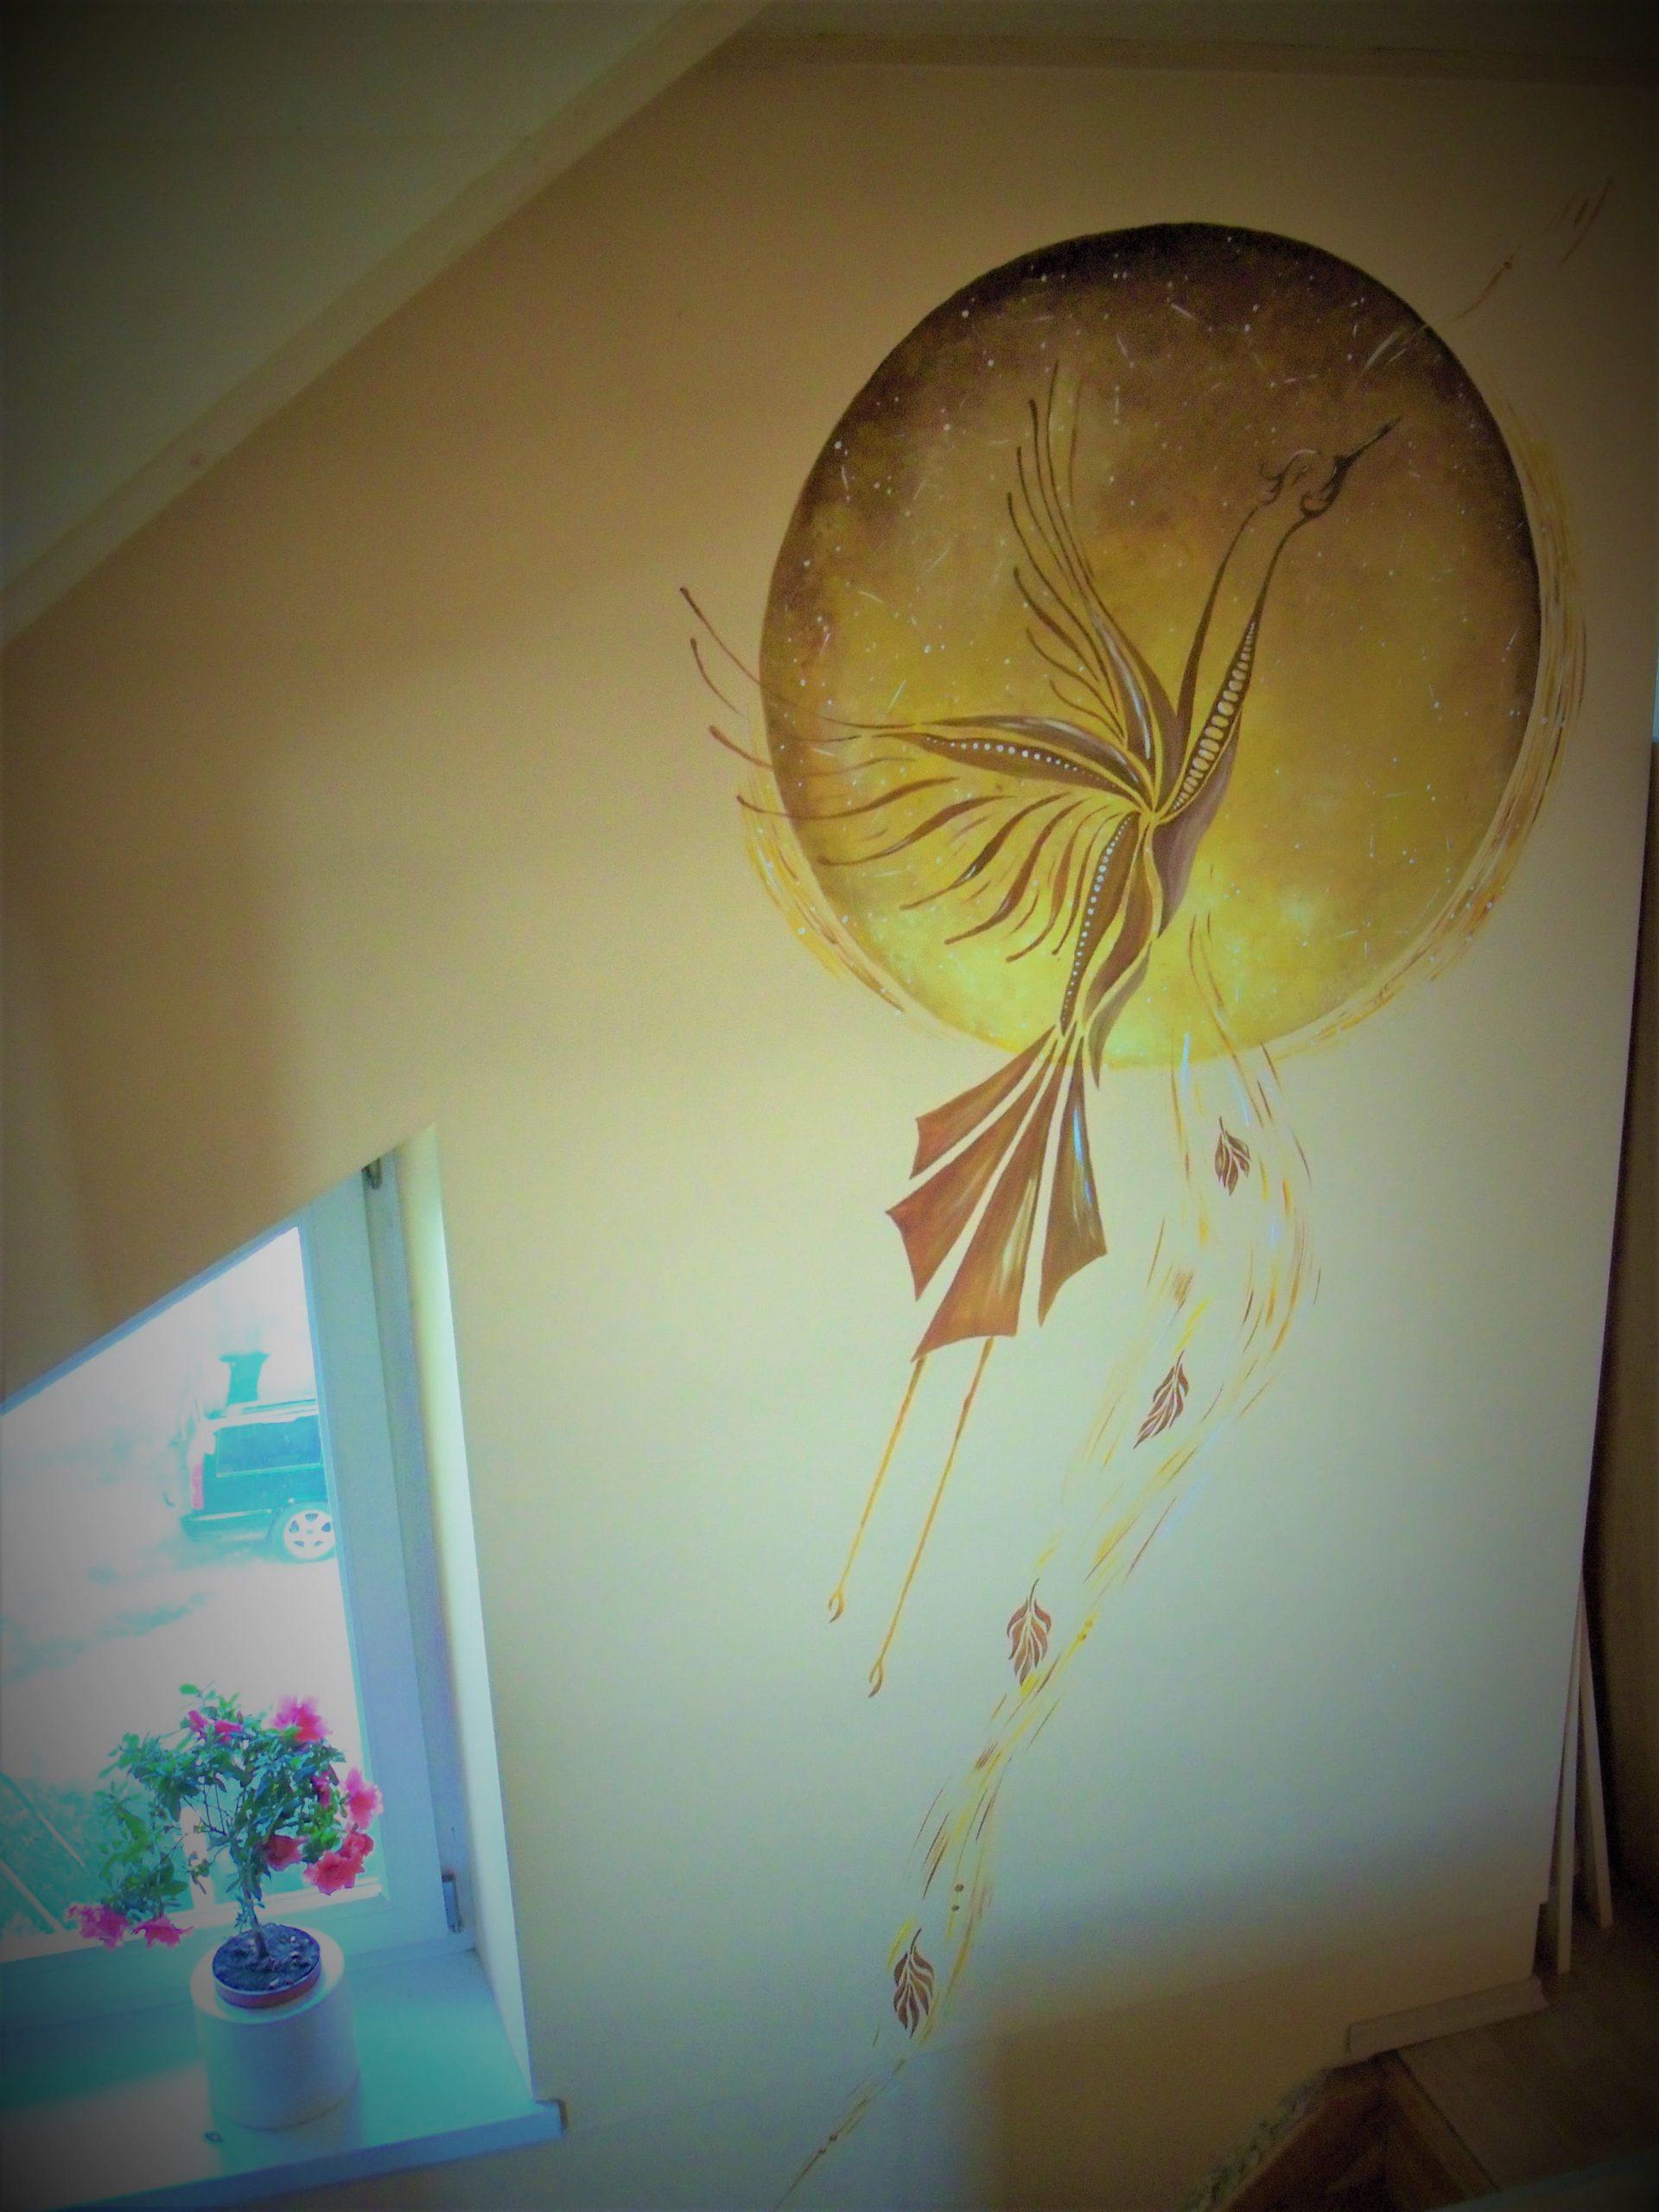 menine-kuryba-sienu-dekoravimas-ivairus-interjerai (47)